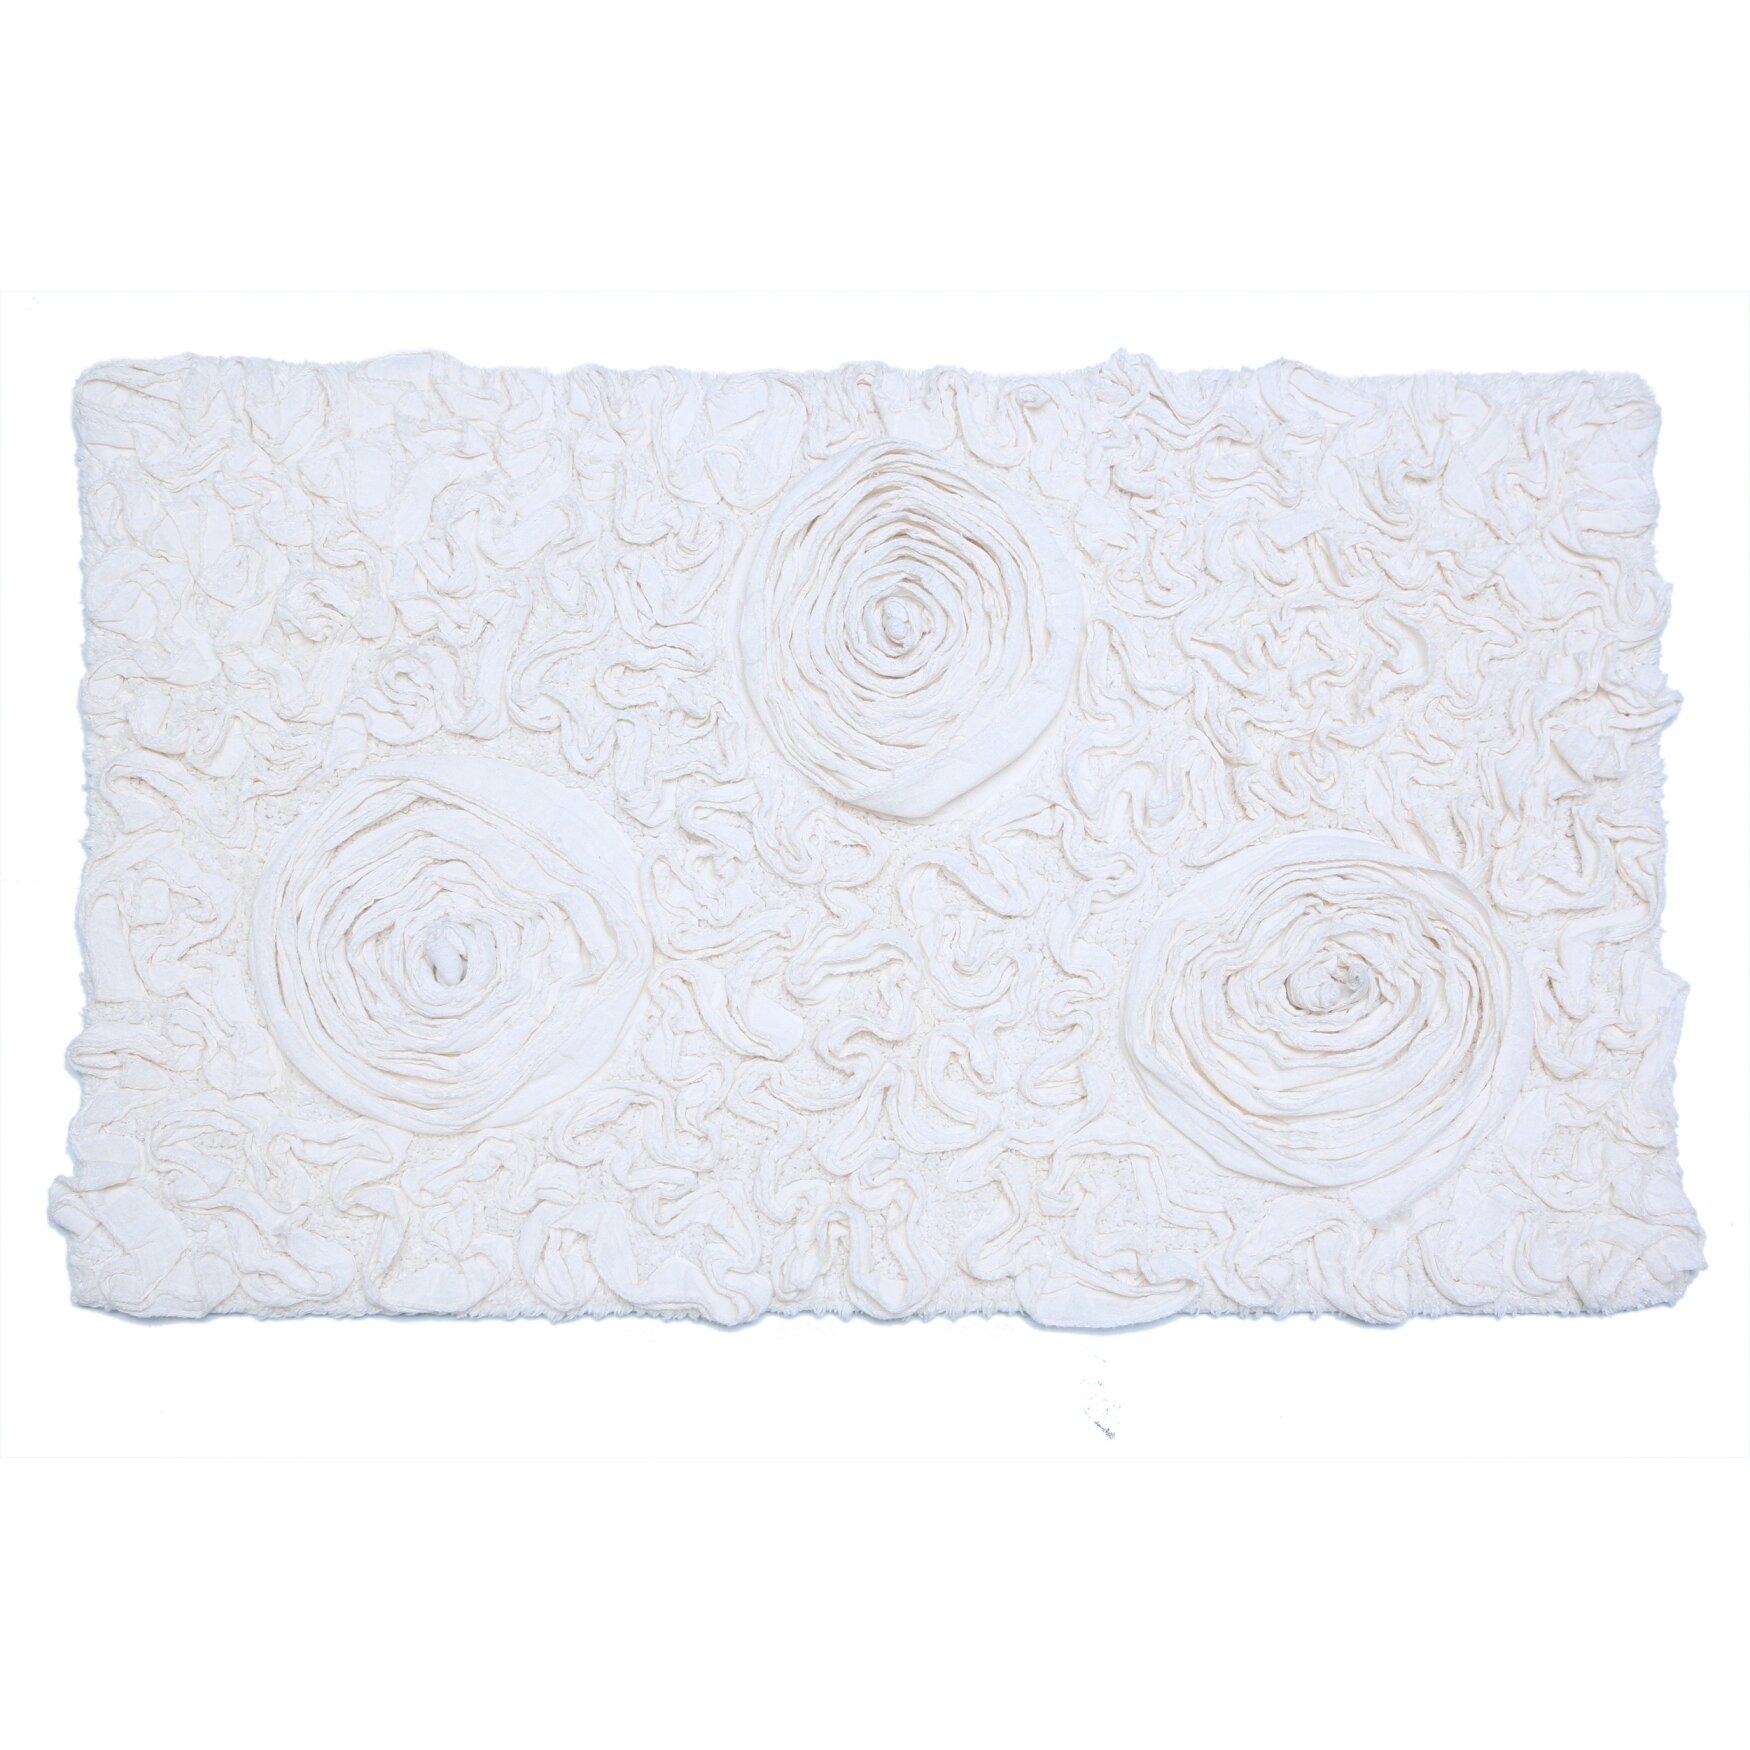 Ess Exports Bell Flower Bath Rug